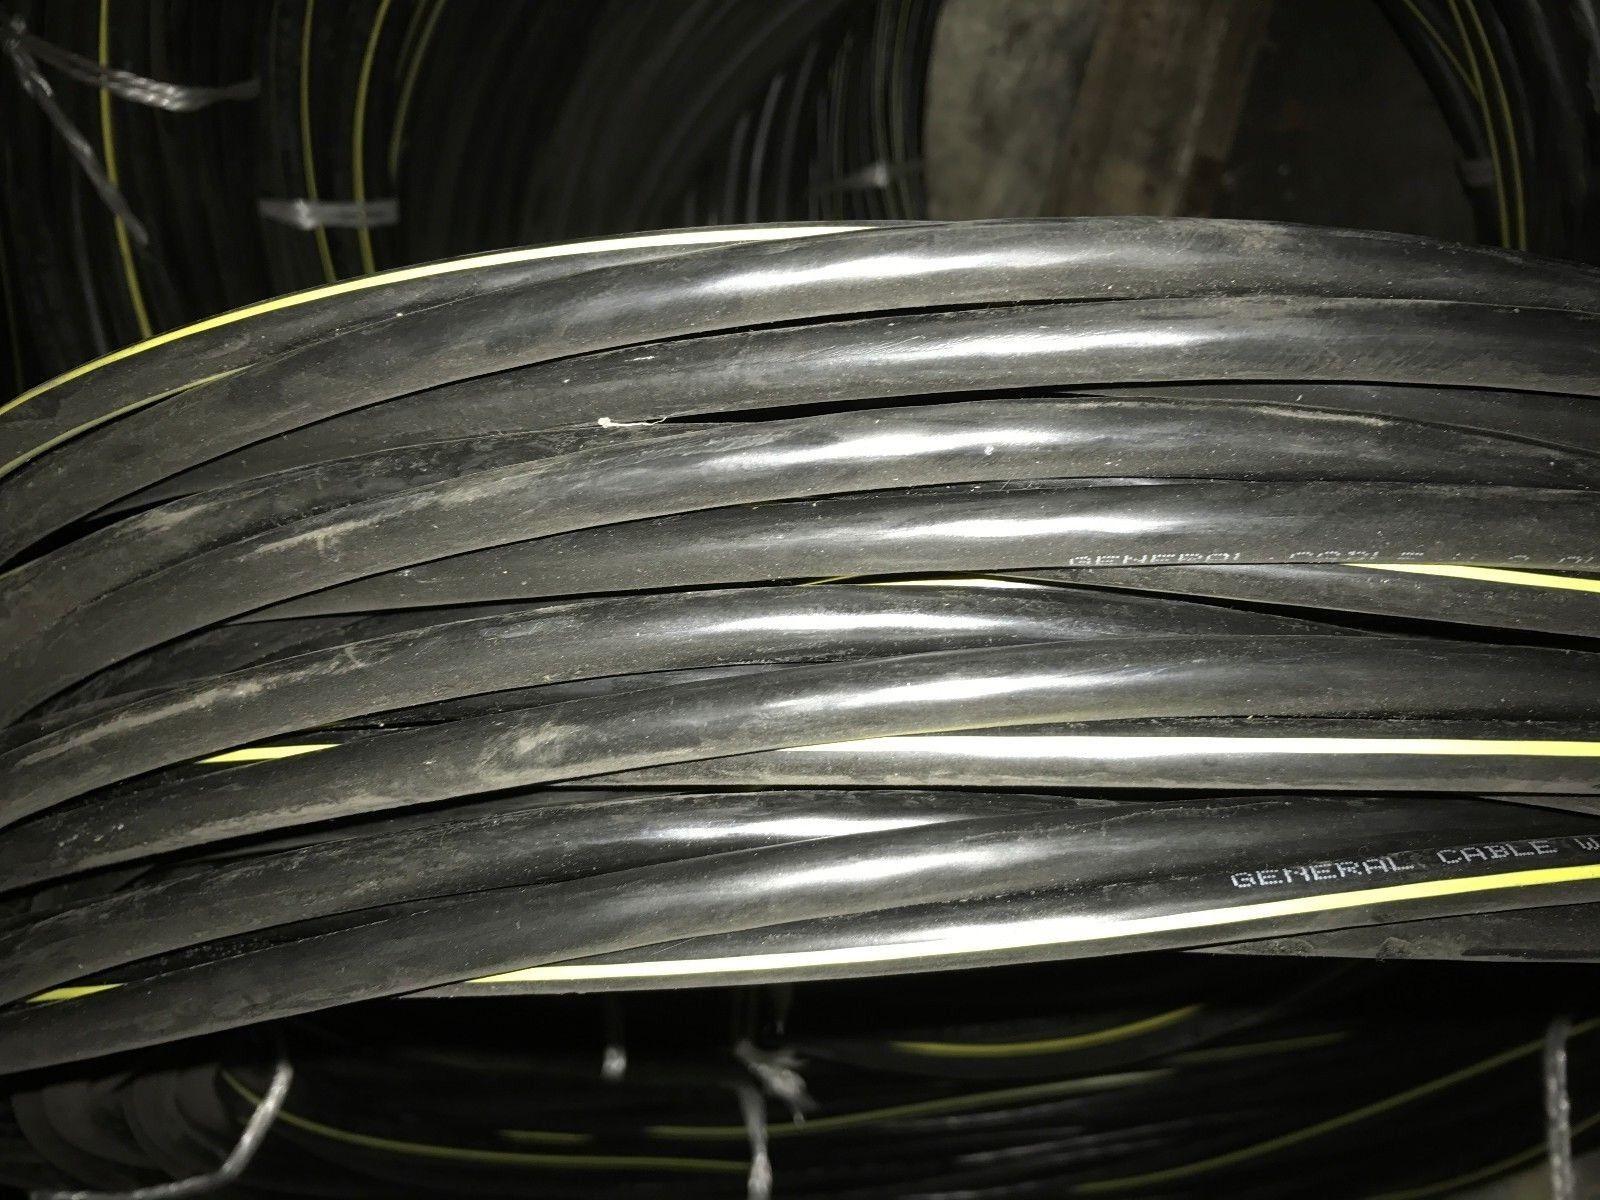 PER FOOT Aluminum URD Triplex Cable 4//0-4//0-2//0 Sweetbriar 600 Volt Wire